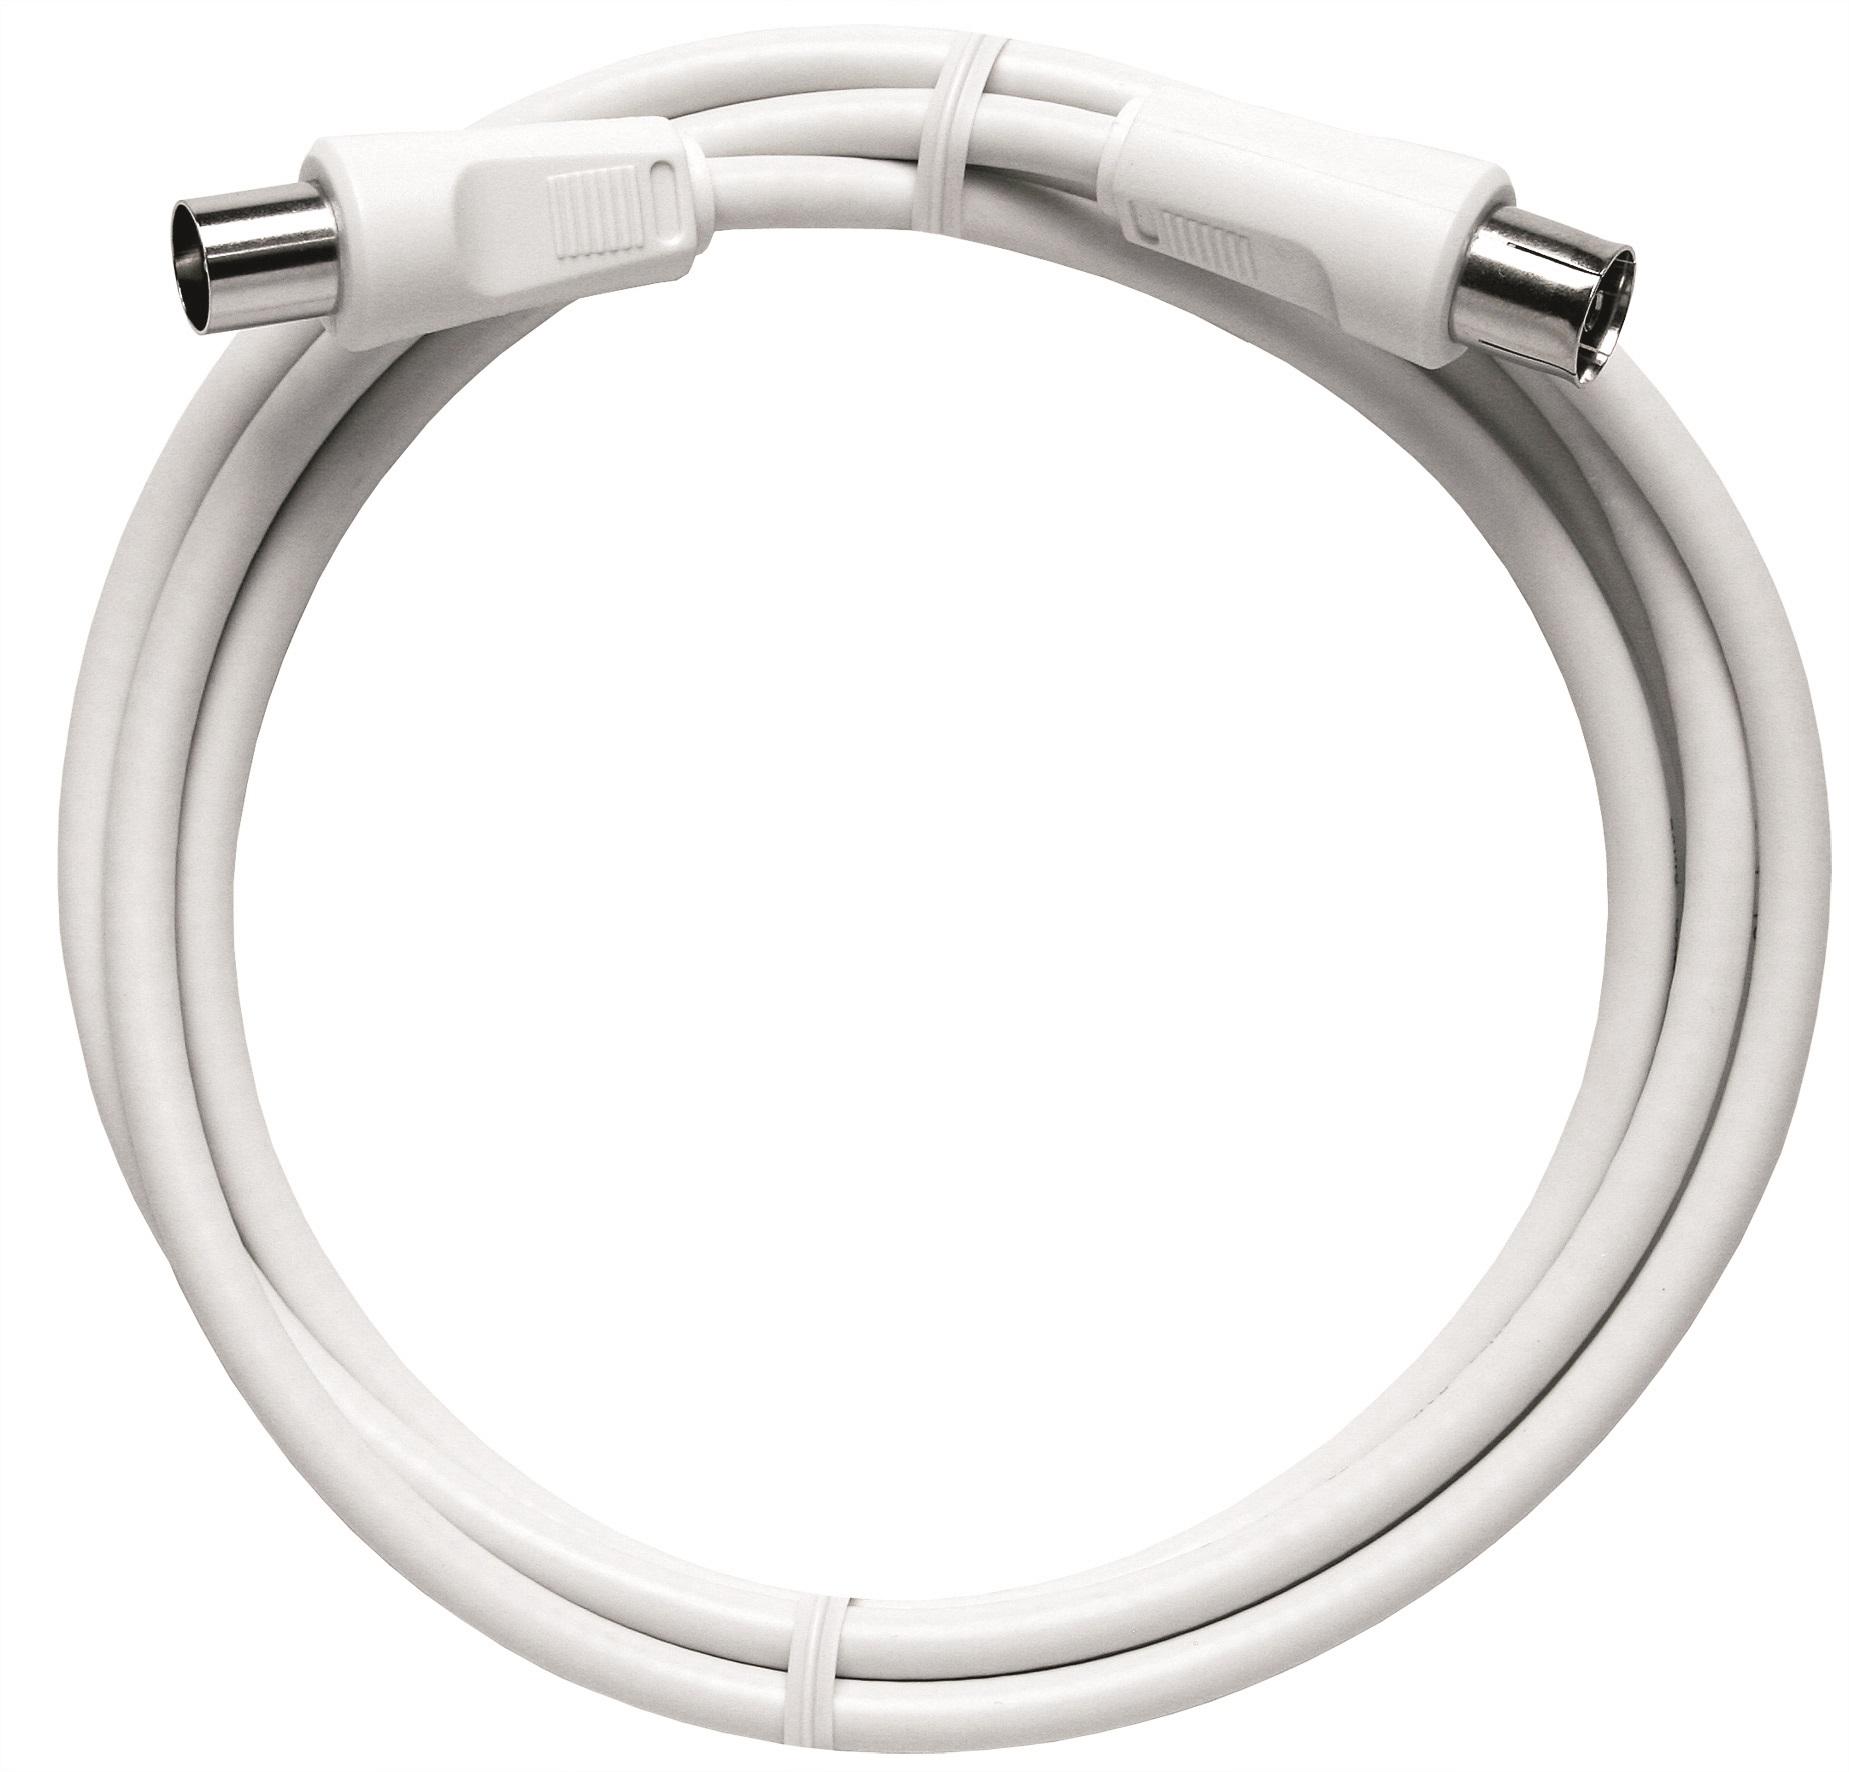 1 Stk BK Koax Patchkabel IEC-M/IEC-F,ger.,Cl.A,ws, 2,5m,BAK 250-90 HSBKPIG2K5